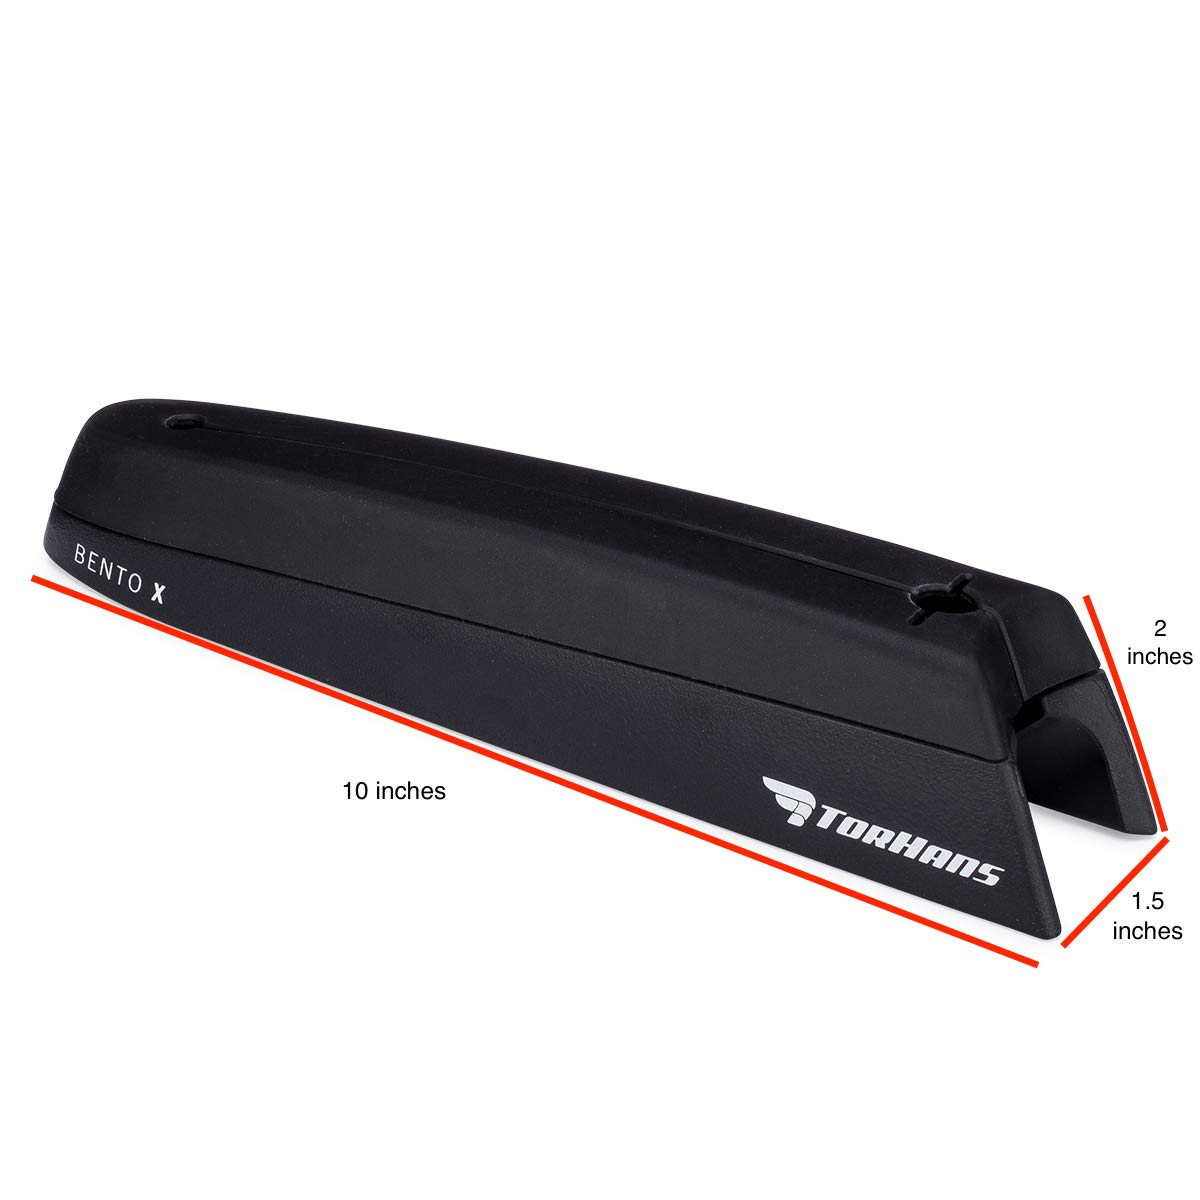 Torhans Bento x ™ Storage Box for Bicycle Frame Time Bike//Triathlon